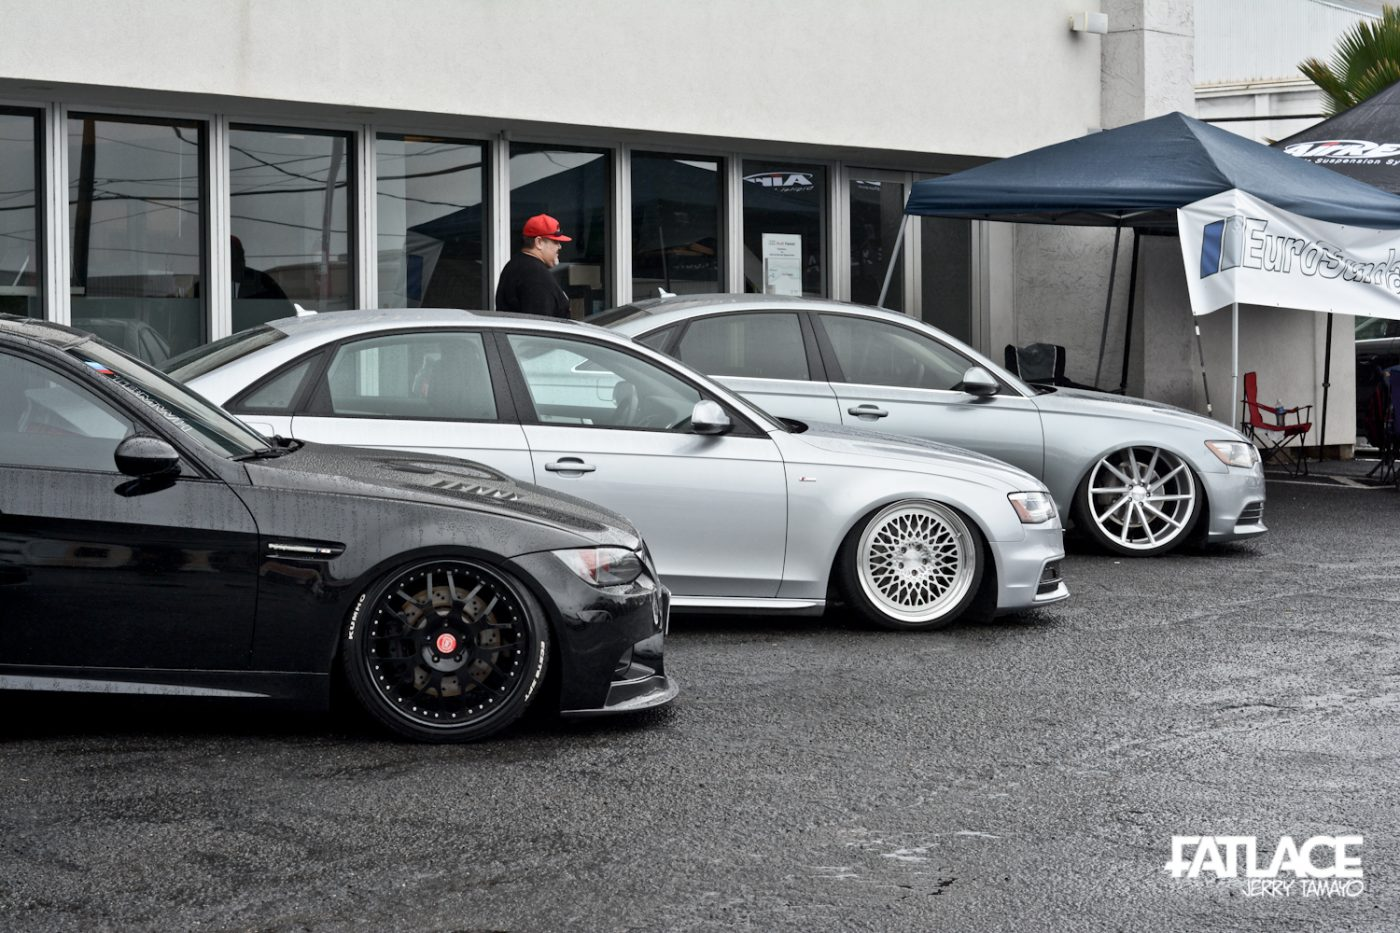 Audi Hawaii Euro Show Fatlace Since - Audi hawaii